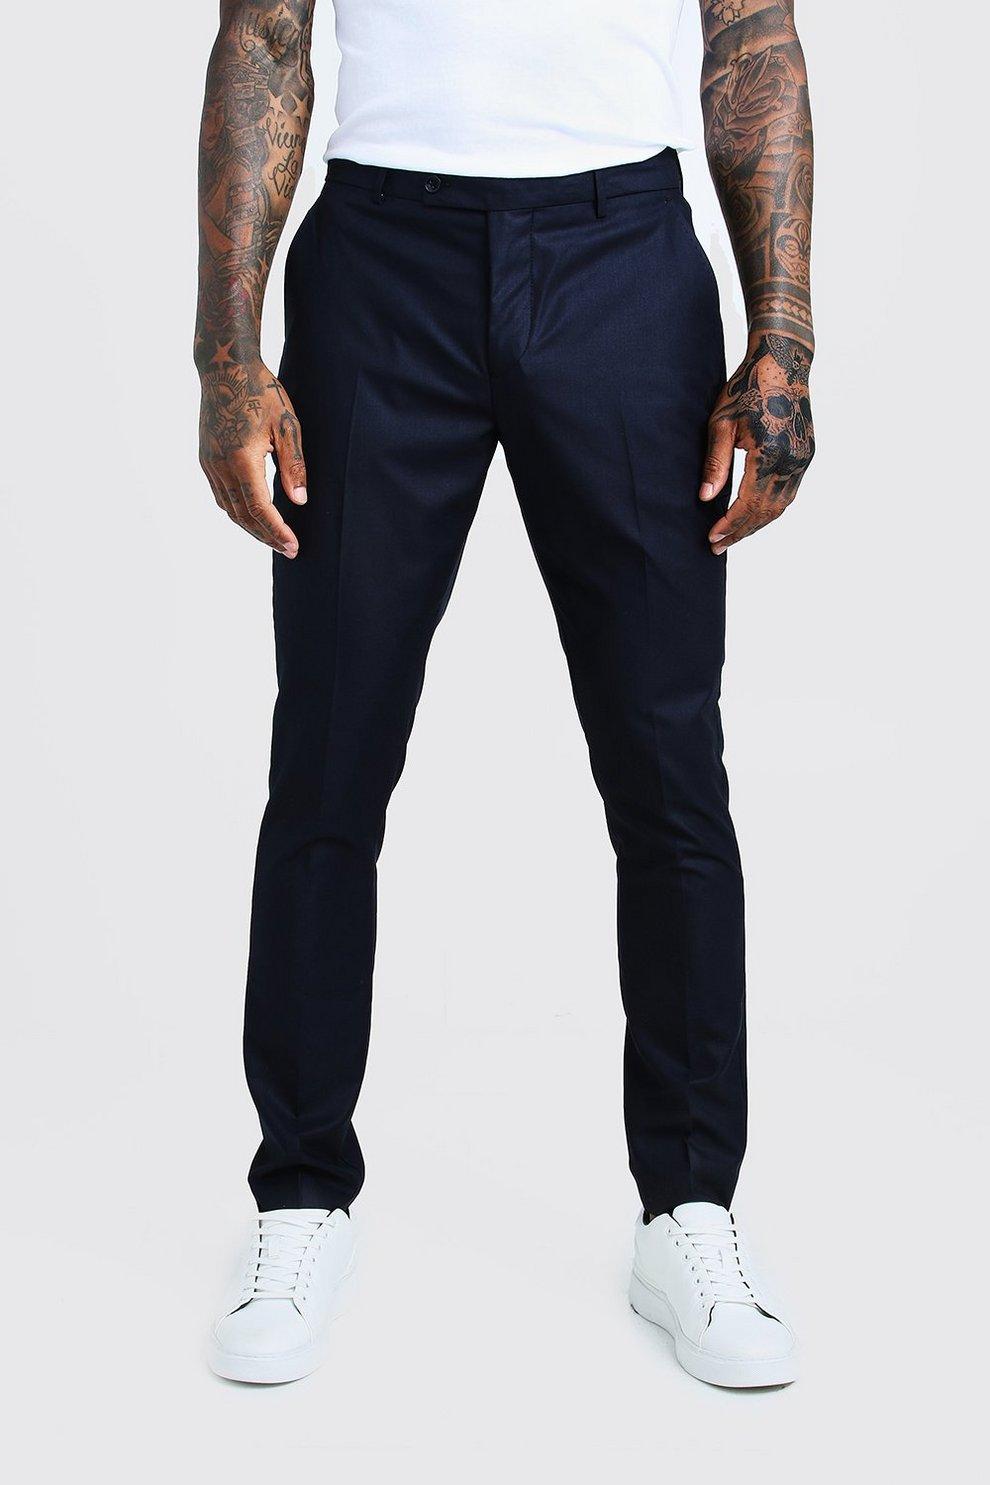 new product 76d60 b94fe Pantaloni eleganti con riga davanti